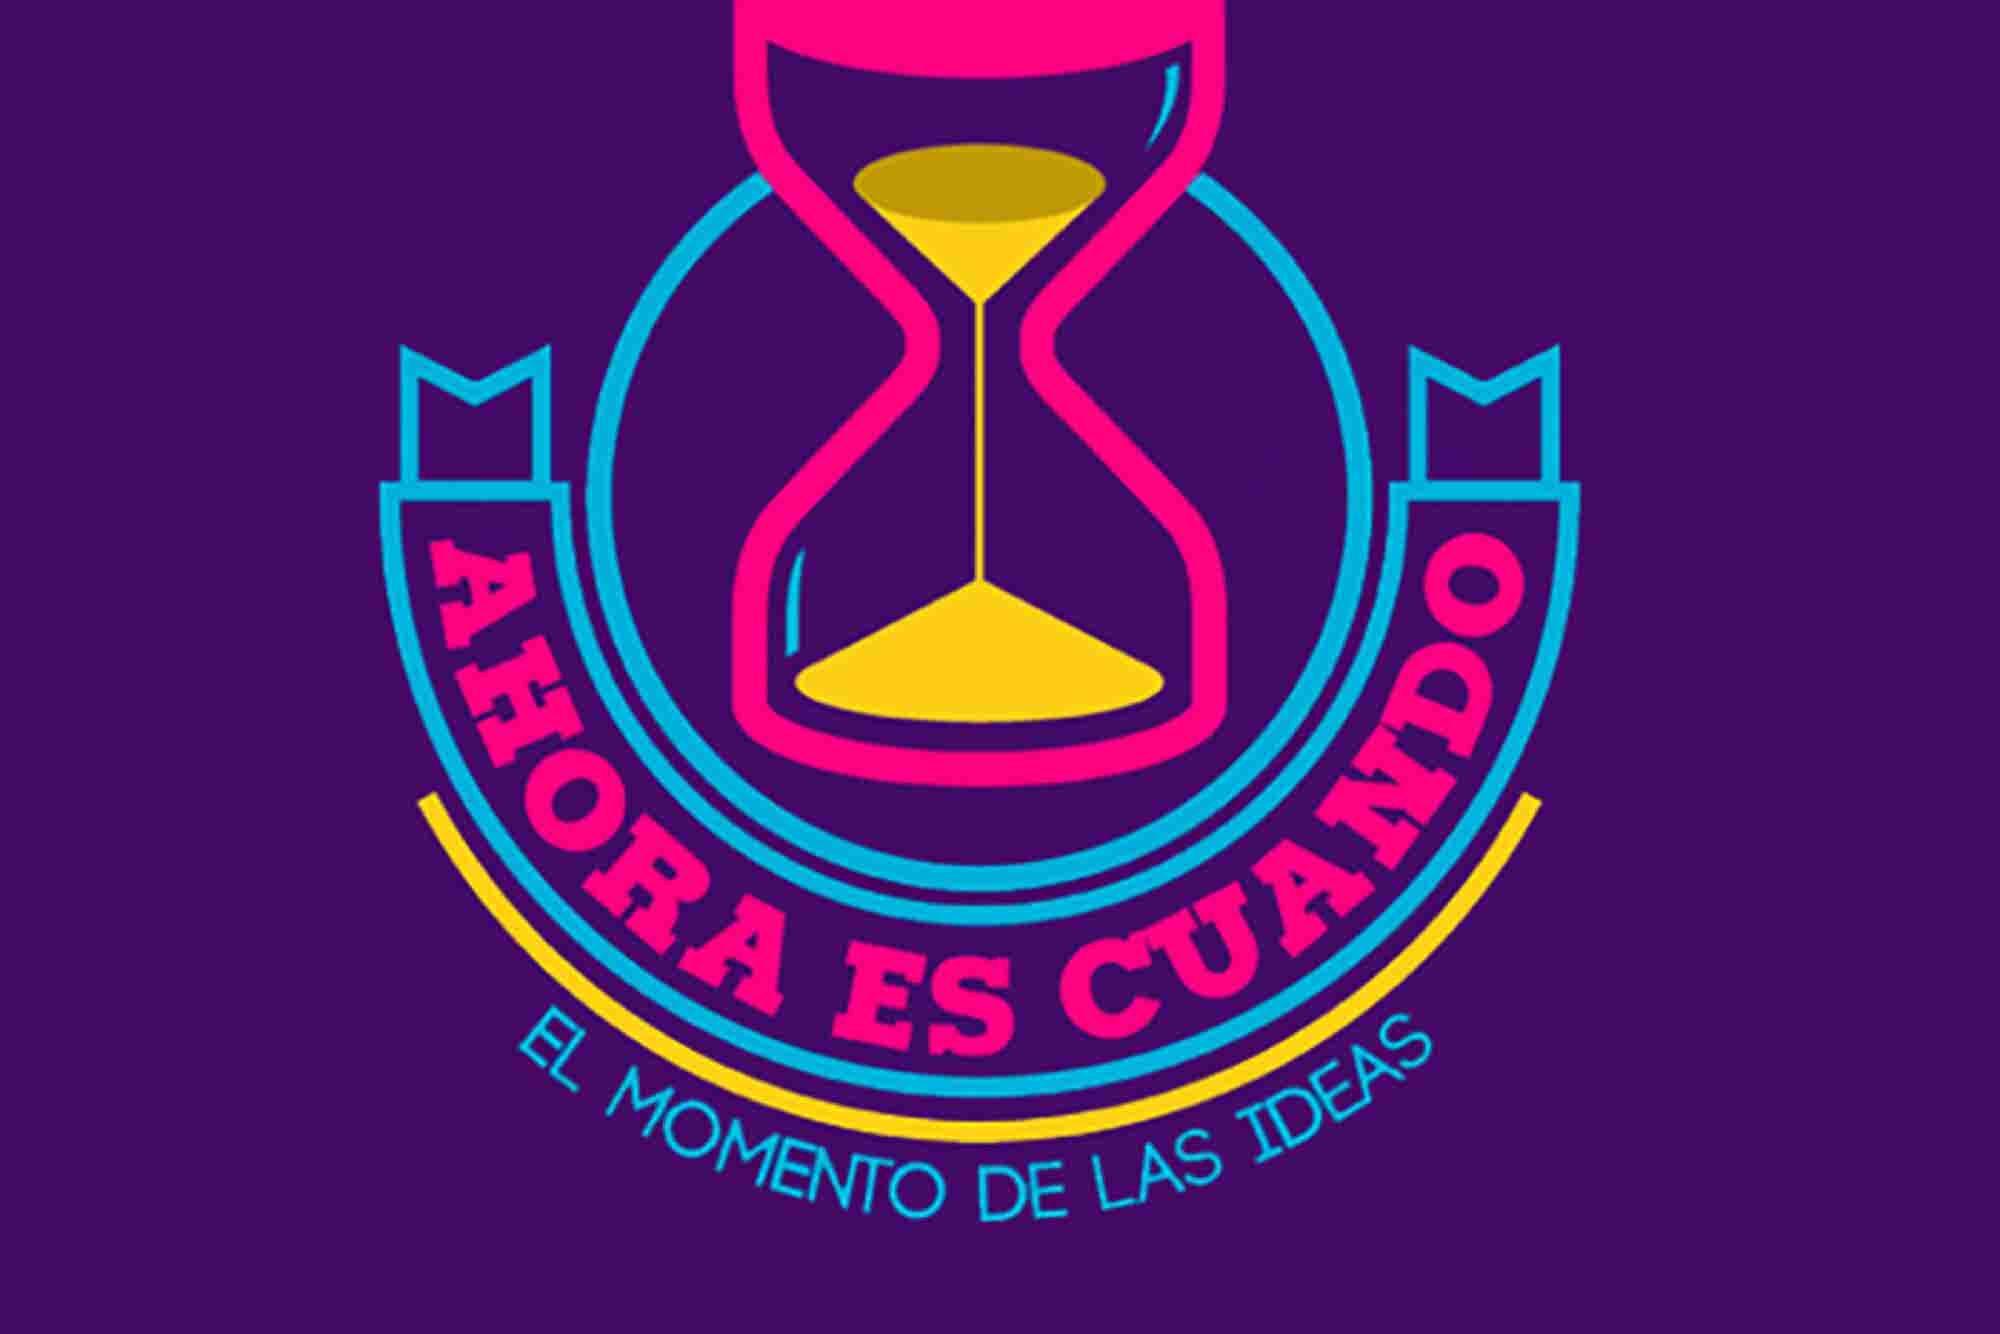 #AhoraEsCuando, 1er desafío de Socialab México